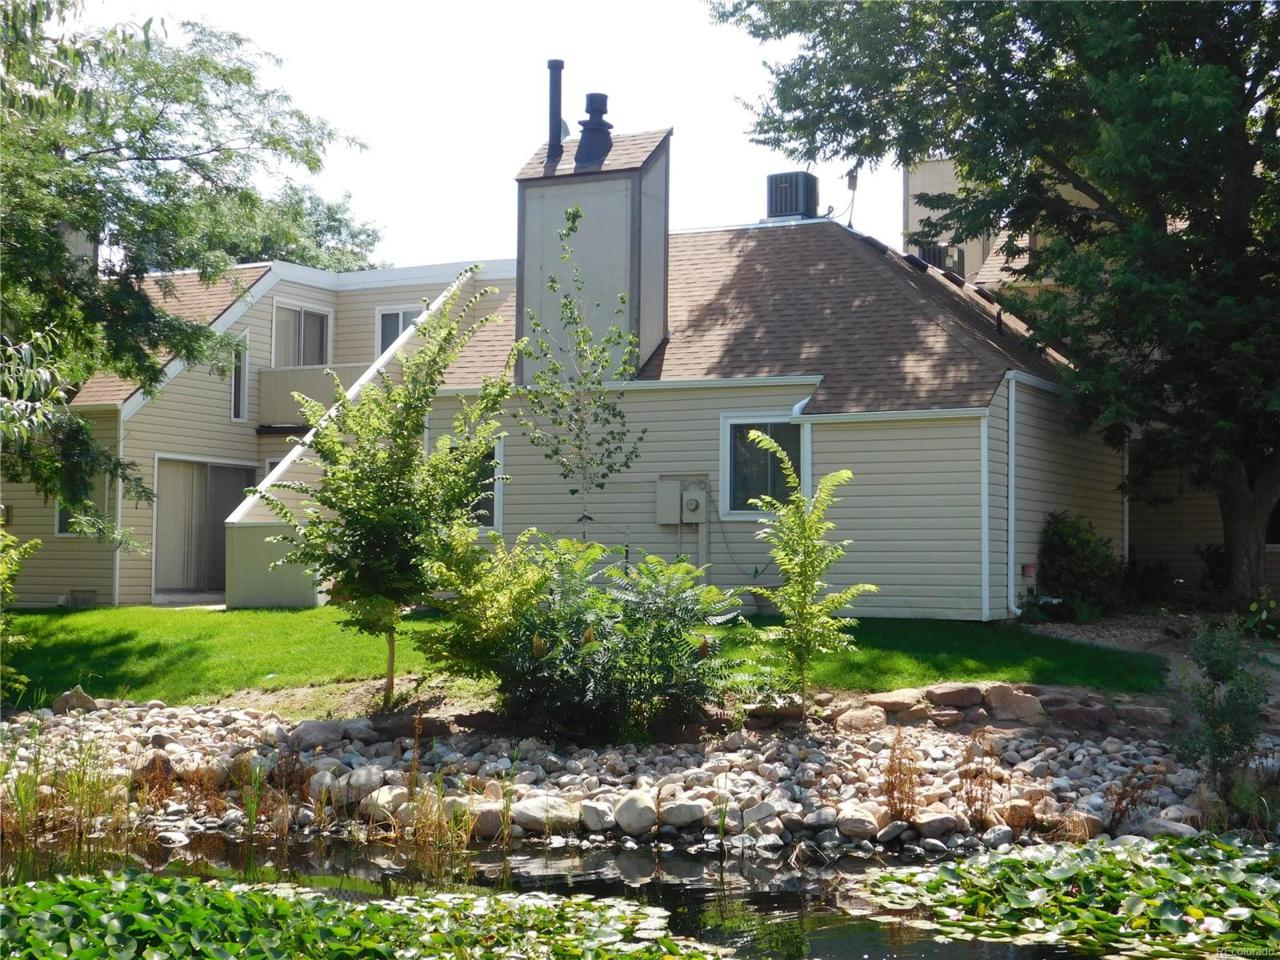 13617 E Yale Avenue A, Aurora, CO 80014 (MLS #4433640) :: 8z Real Estate